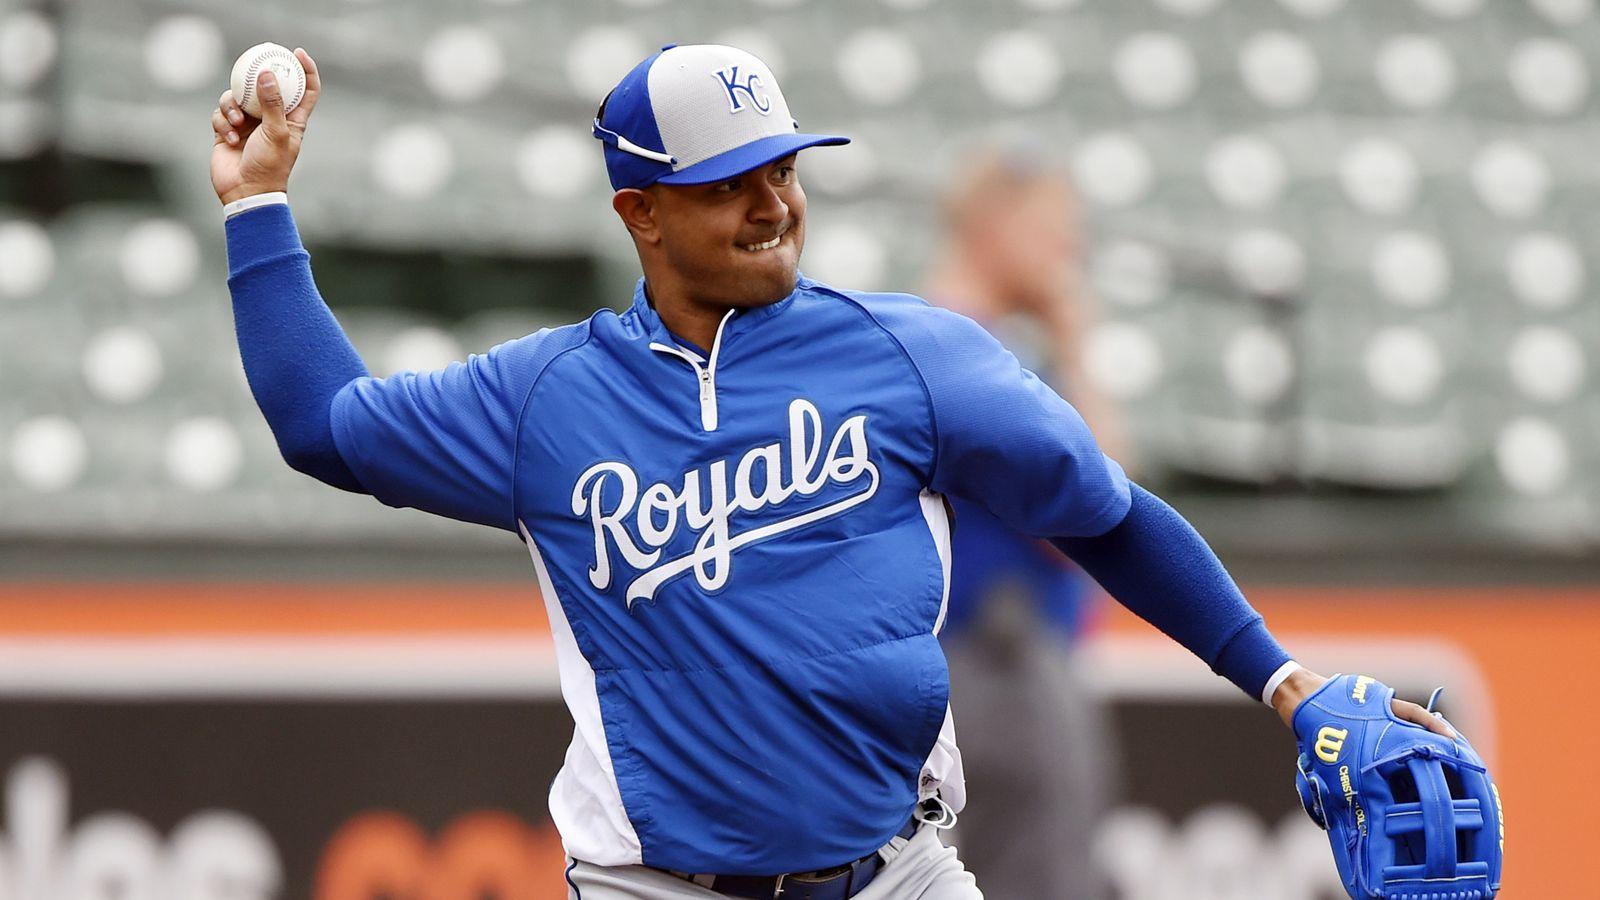 Baseball America's top ten Royals prospects